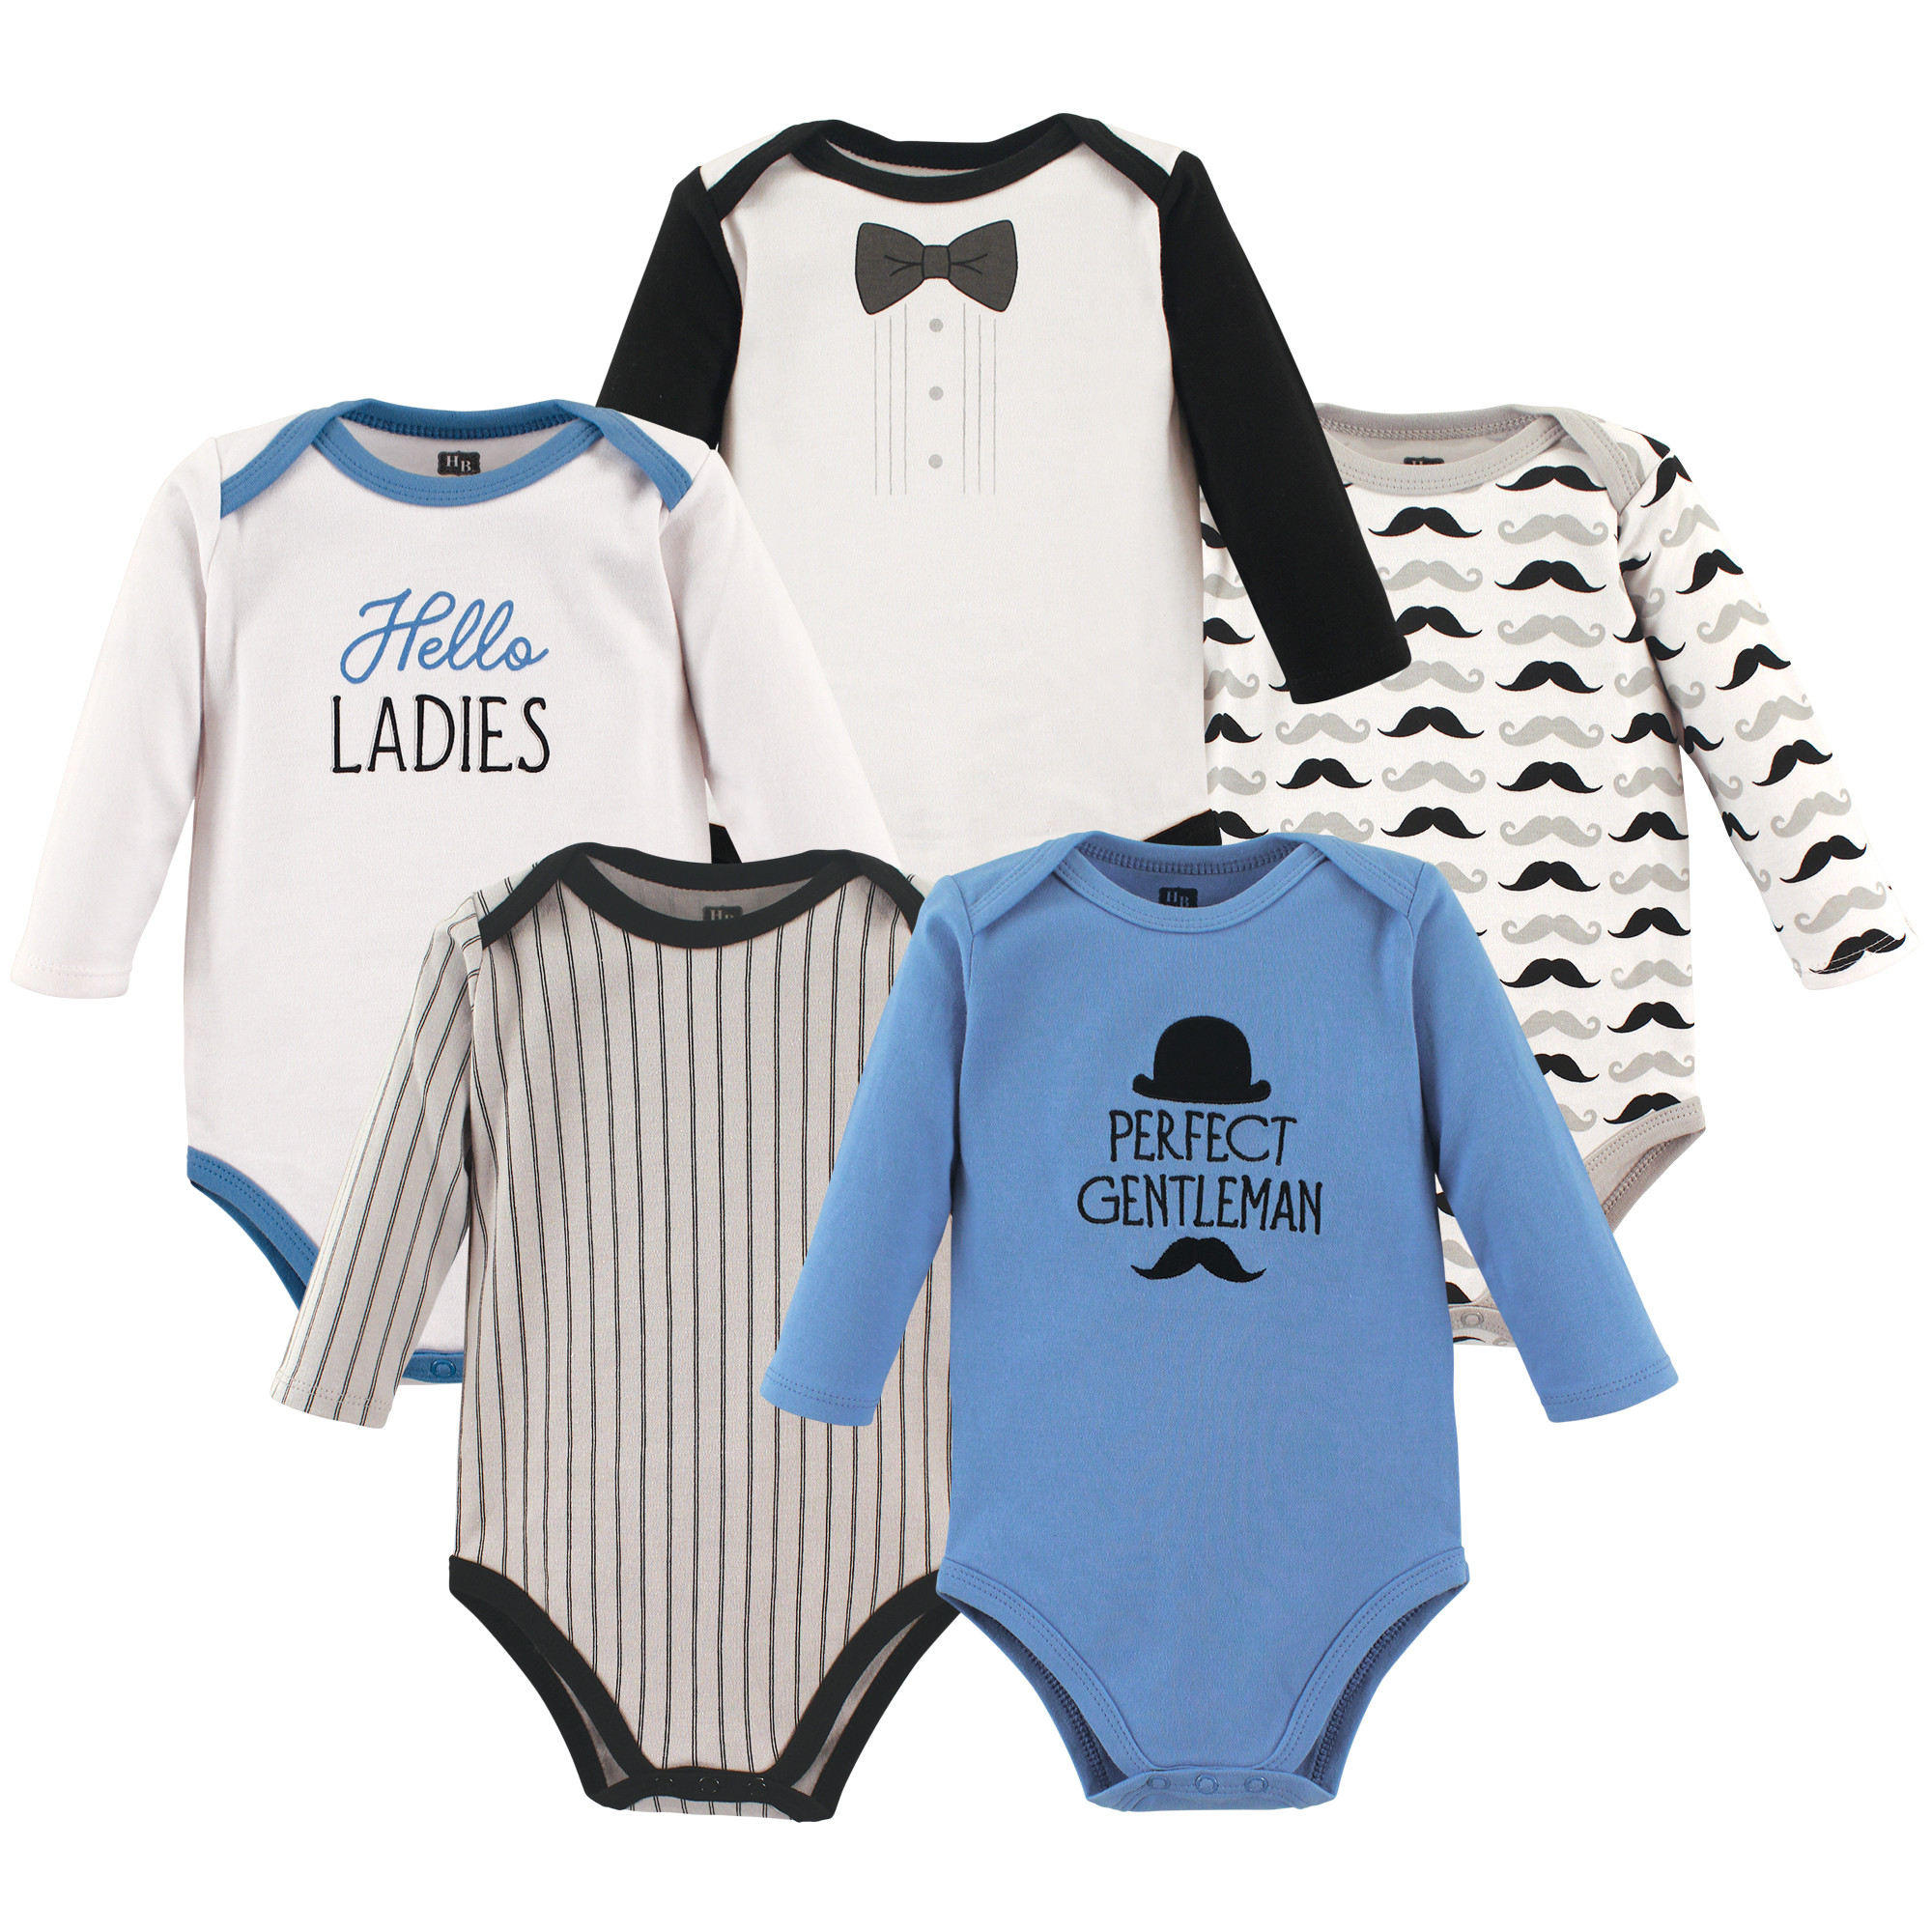 247f6e396 Long Sleeve Bodysuits, 5 Pack, Perfect Gentleman. Hudson Baby